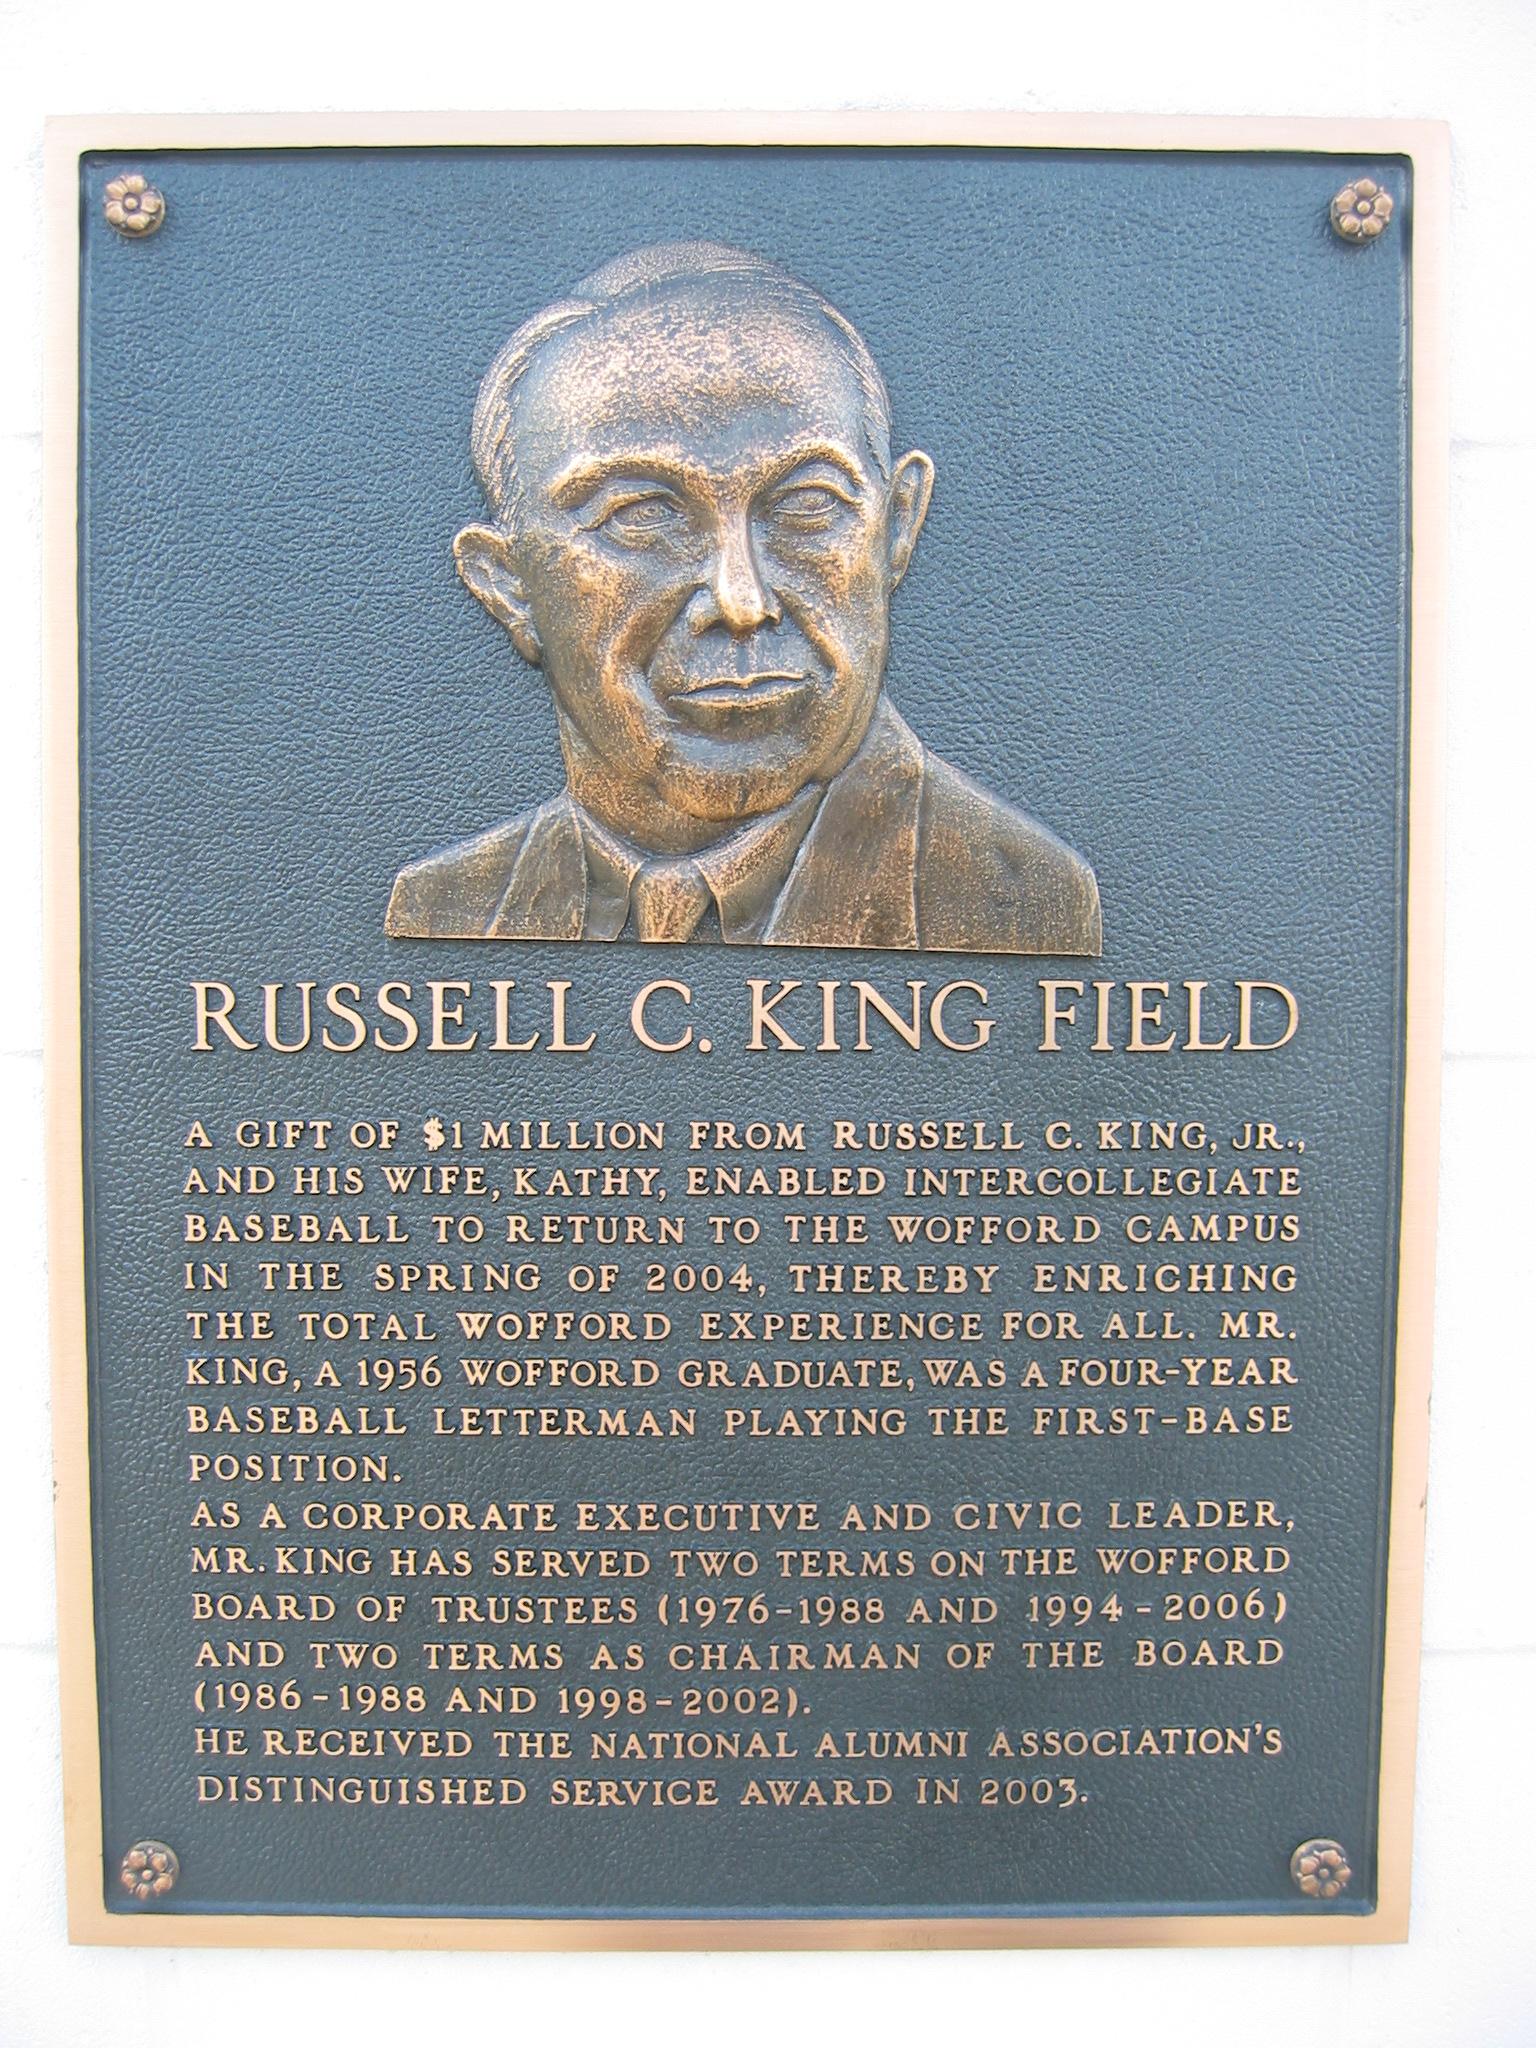 russellkingfield5